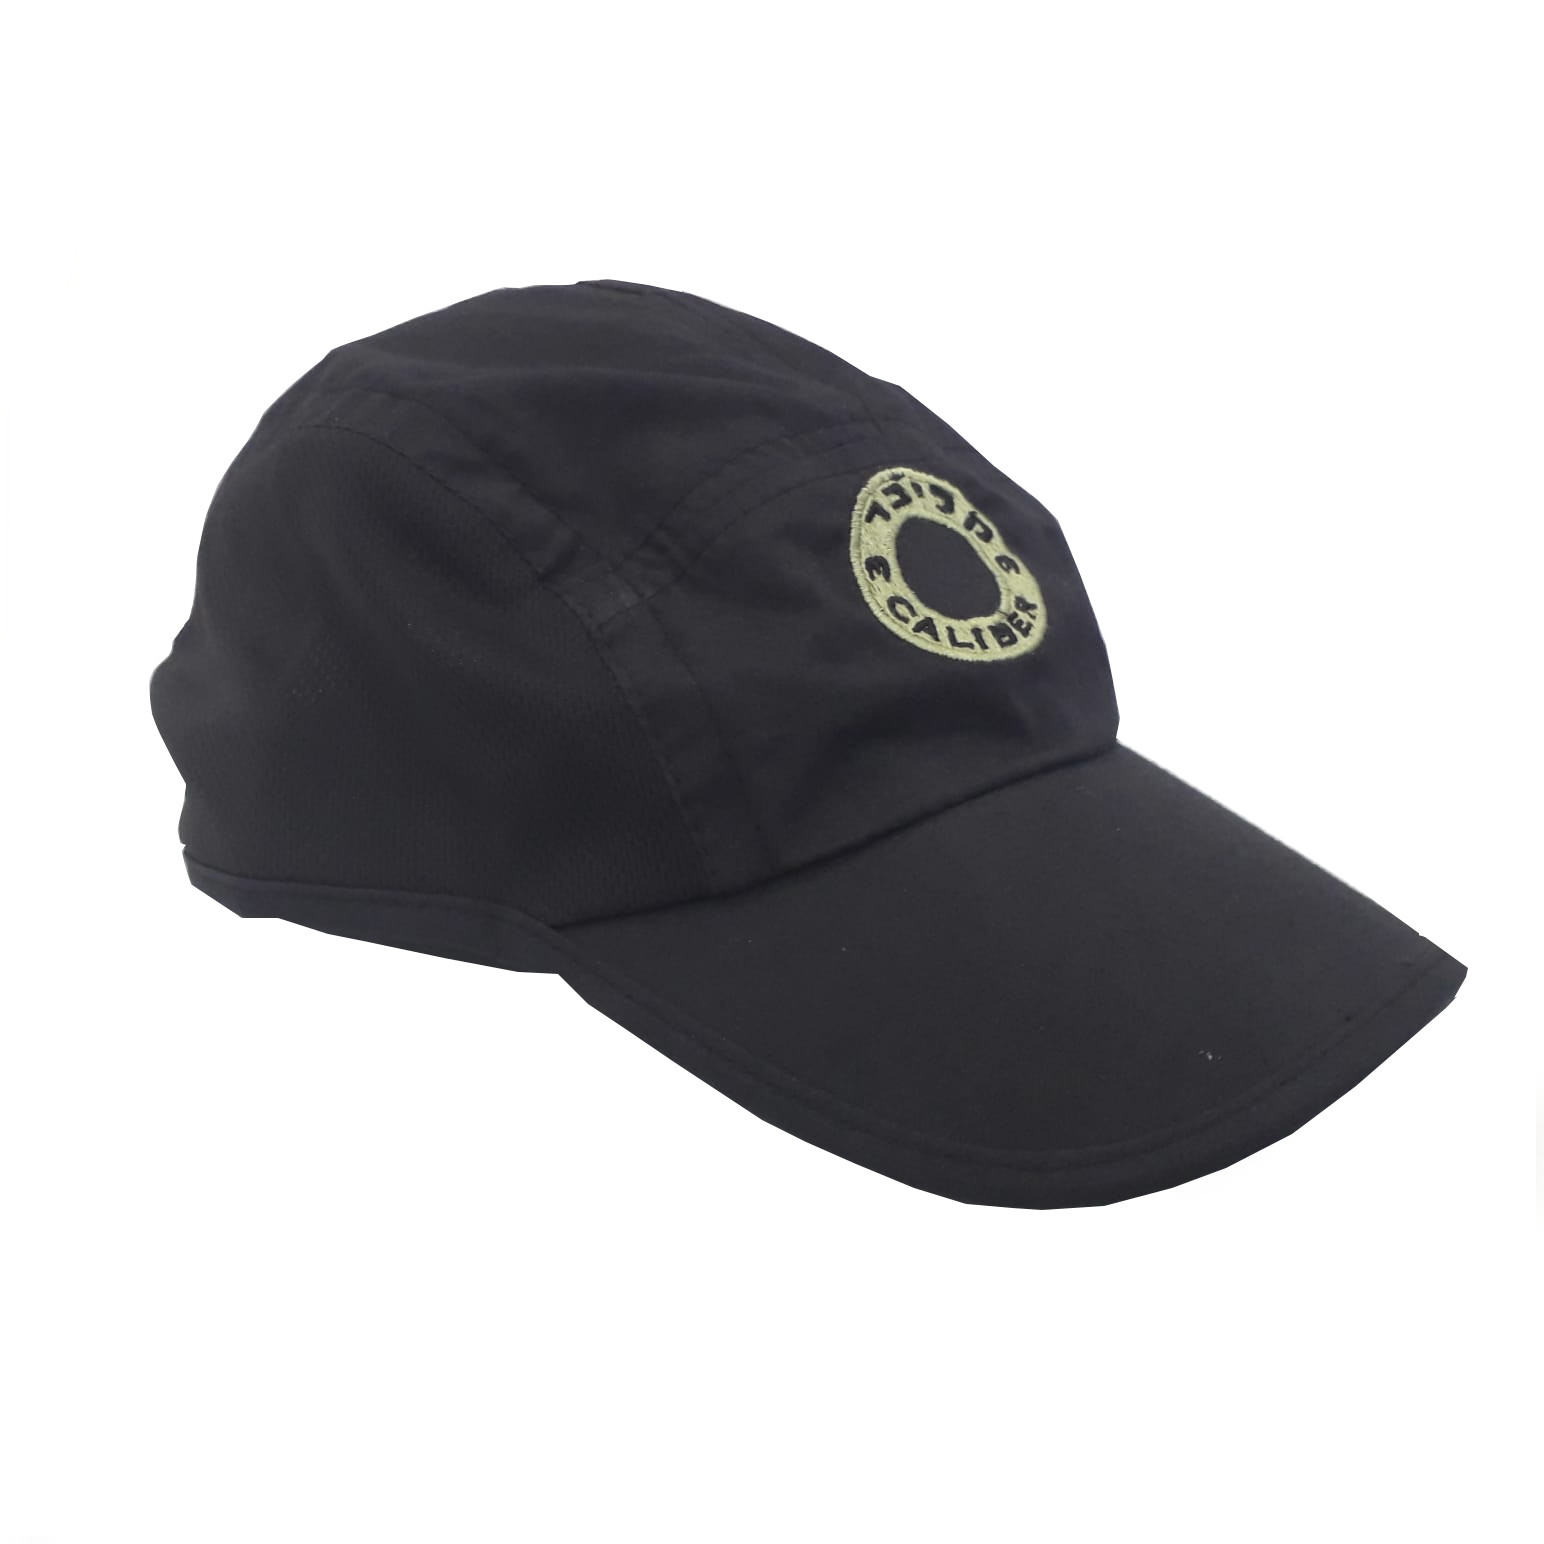 black dryfit hat.jpeg